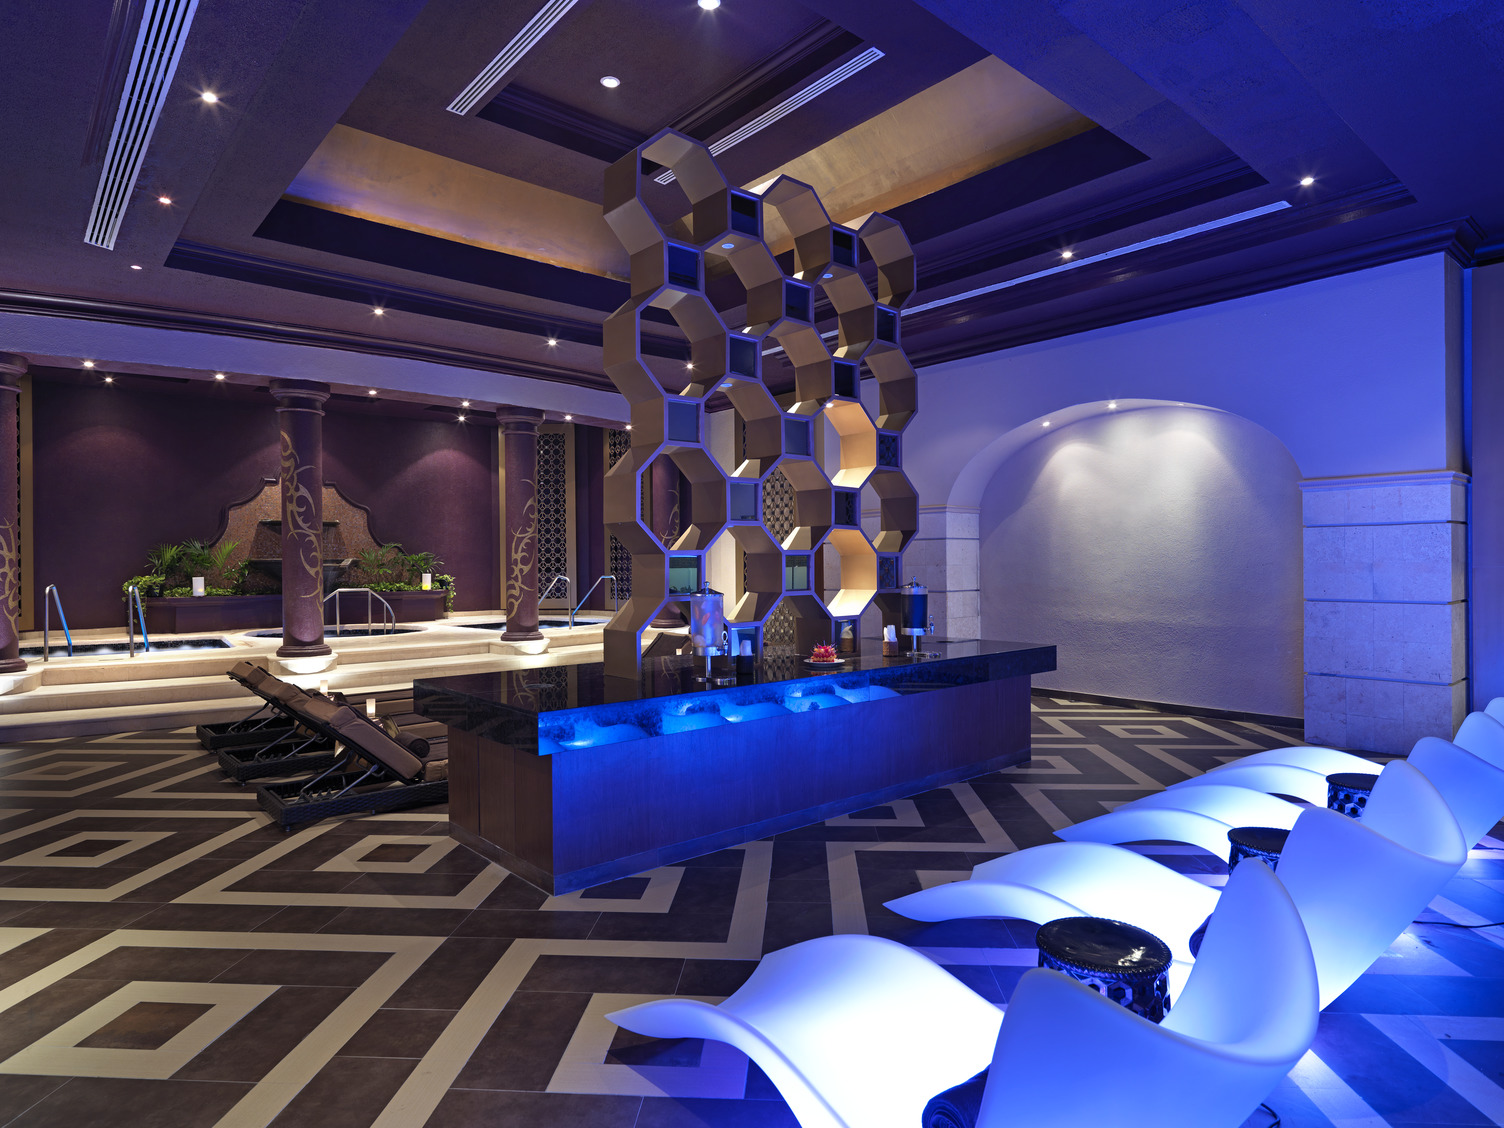 Travel Agency All-Inclusive Resort Heaven at Hard Rock Hotel Riviera Maya 60